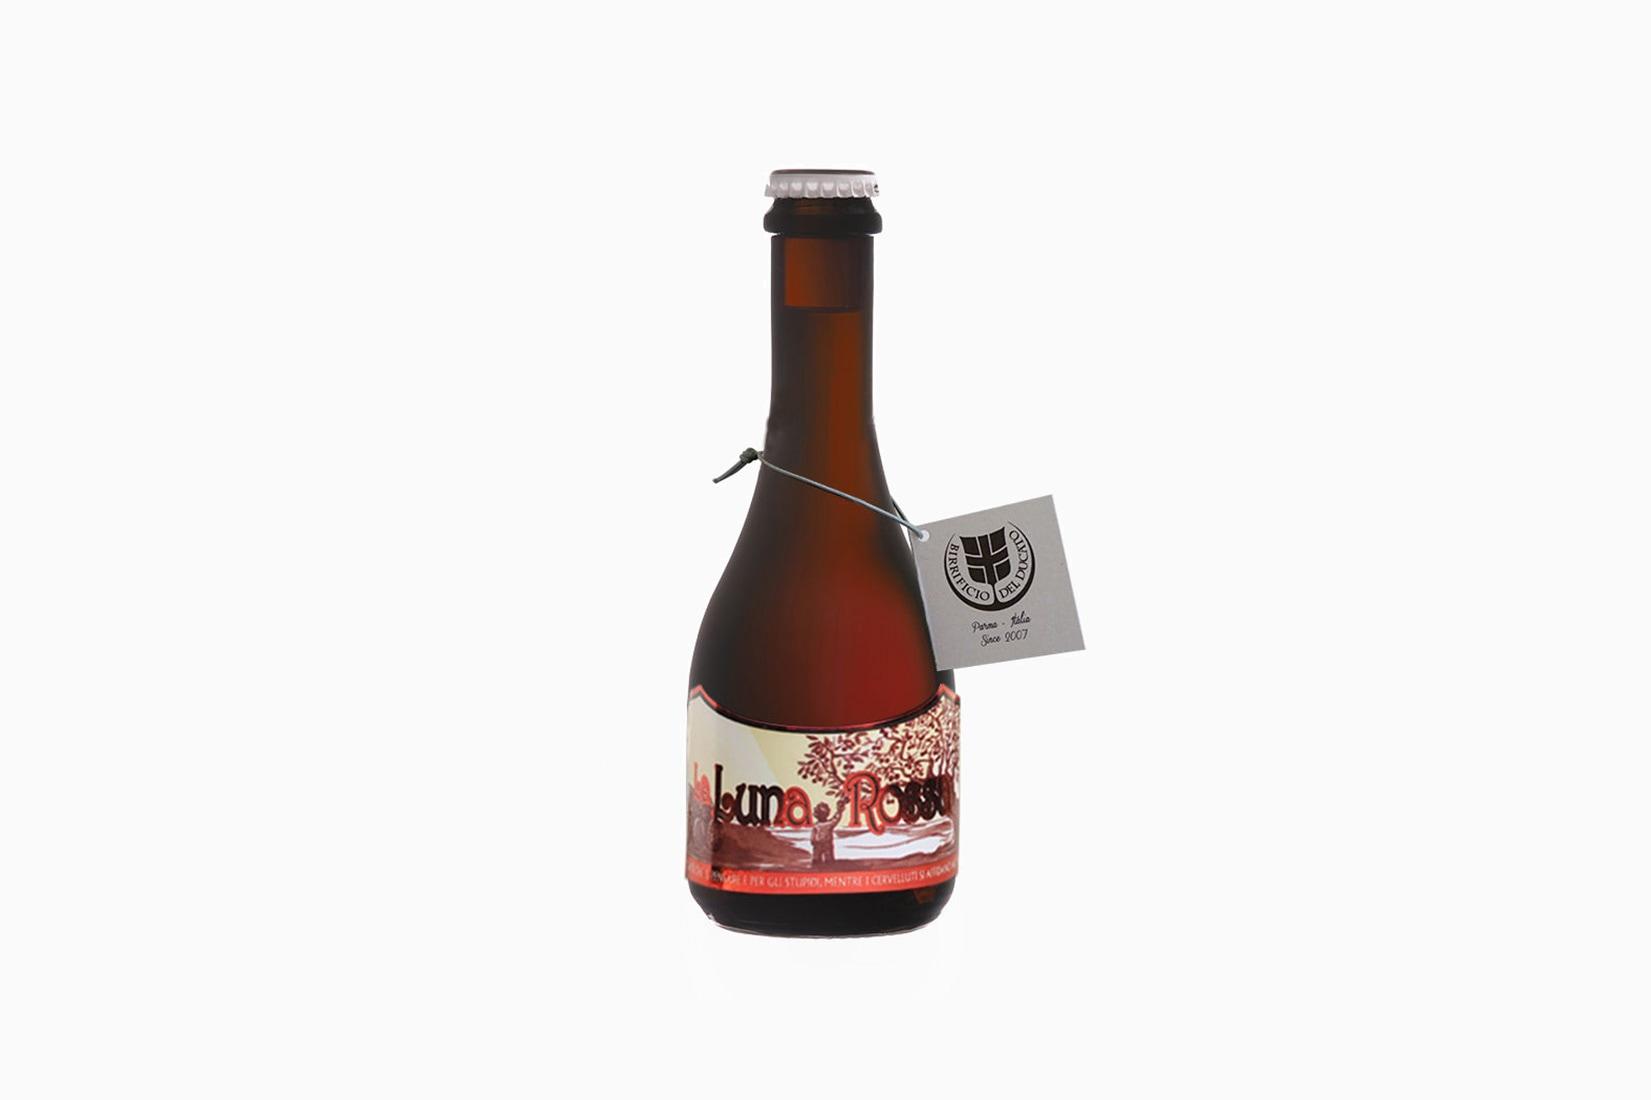 best beer brands birrificio del ducato la luna rossa - Luxe Digital